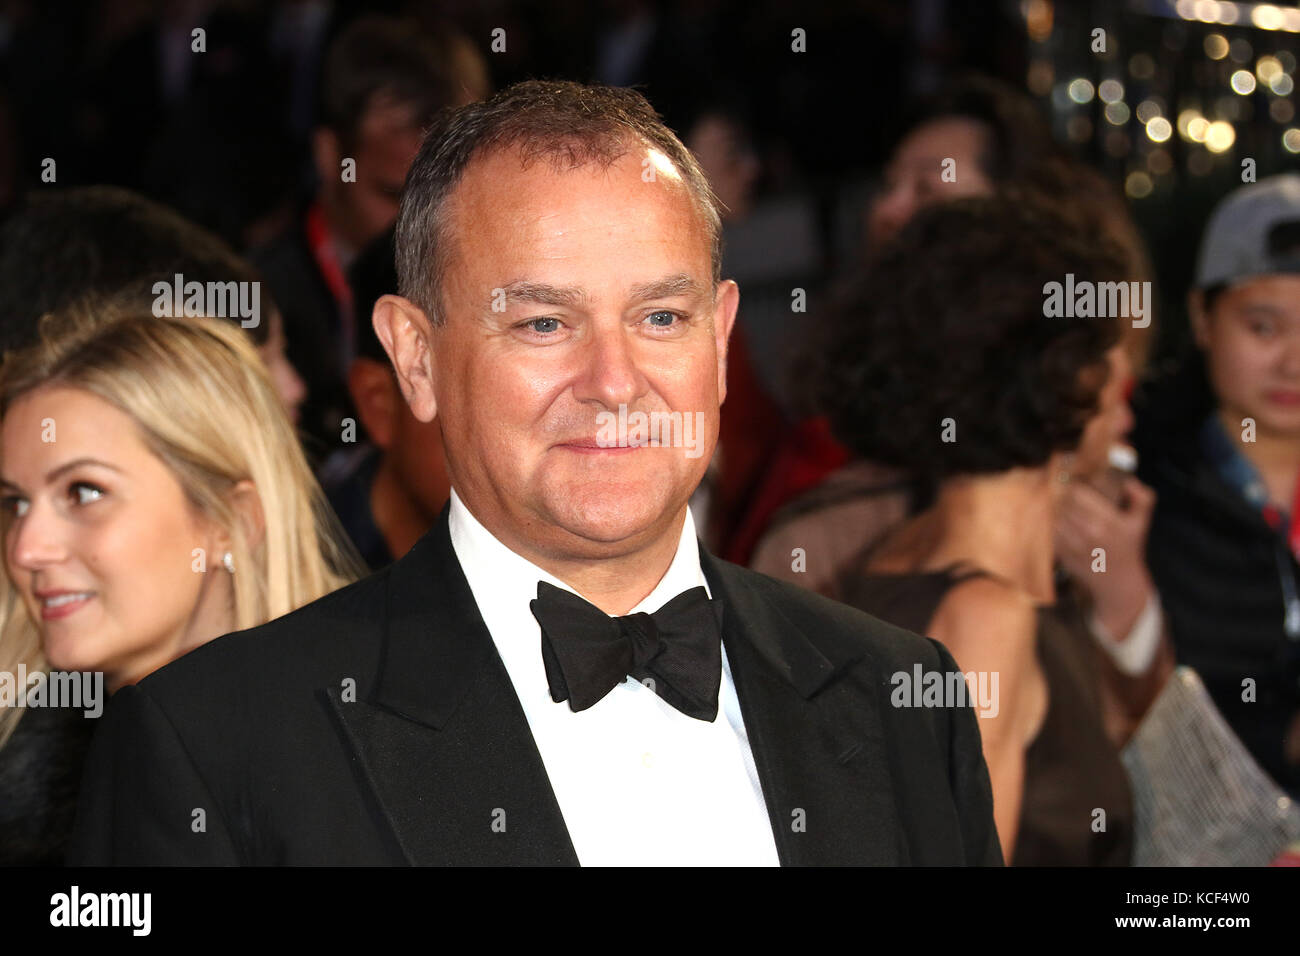 Londres, Reino Unido. 4 Oct, 2017. Hugh Bonneville, respirar - BFI LFF Apertura de la Noche de Gala, Leicester Square, Foto de stock